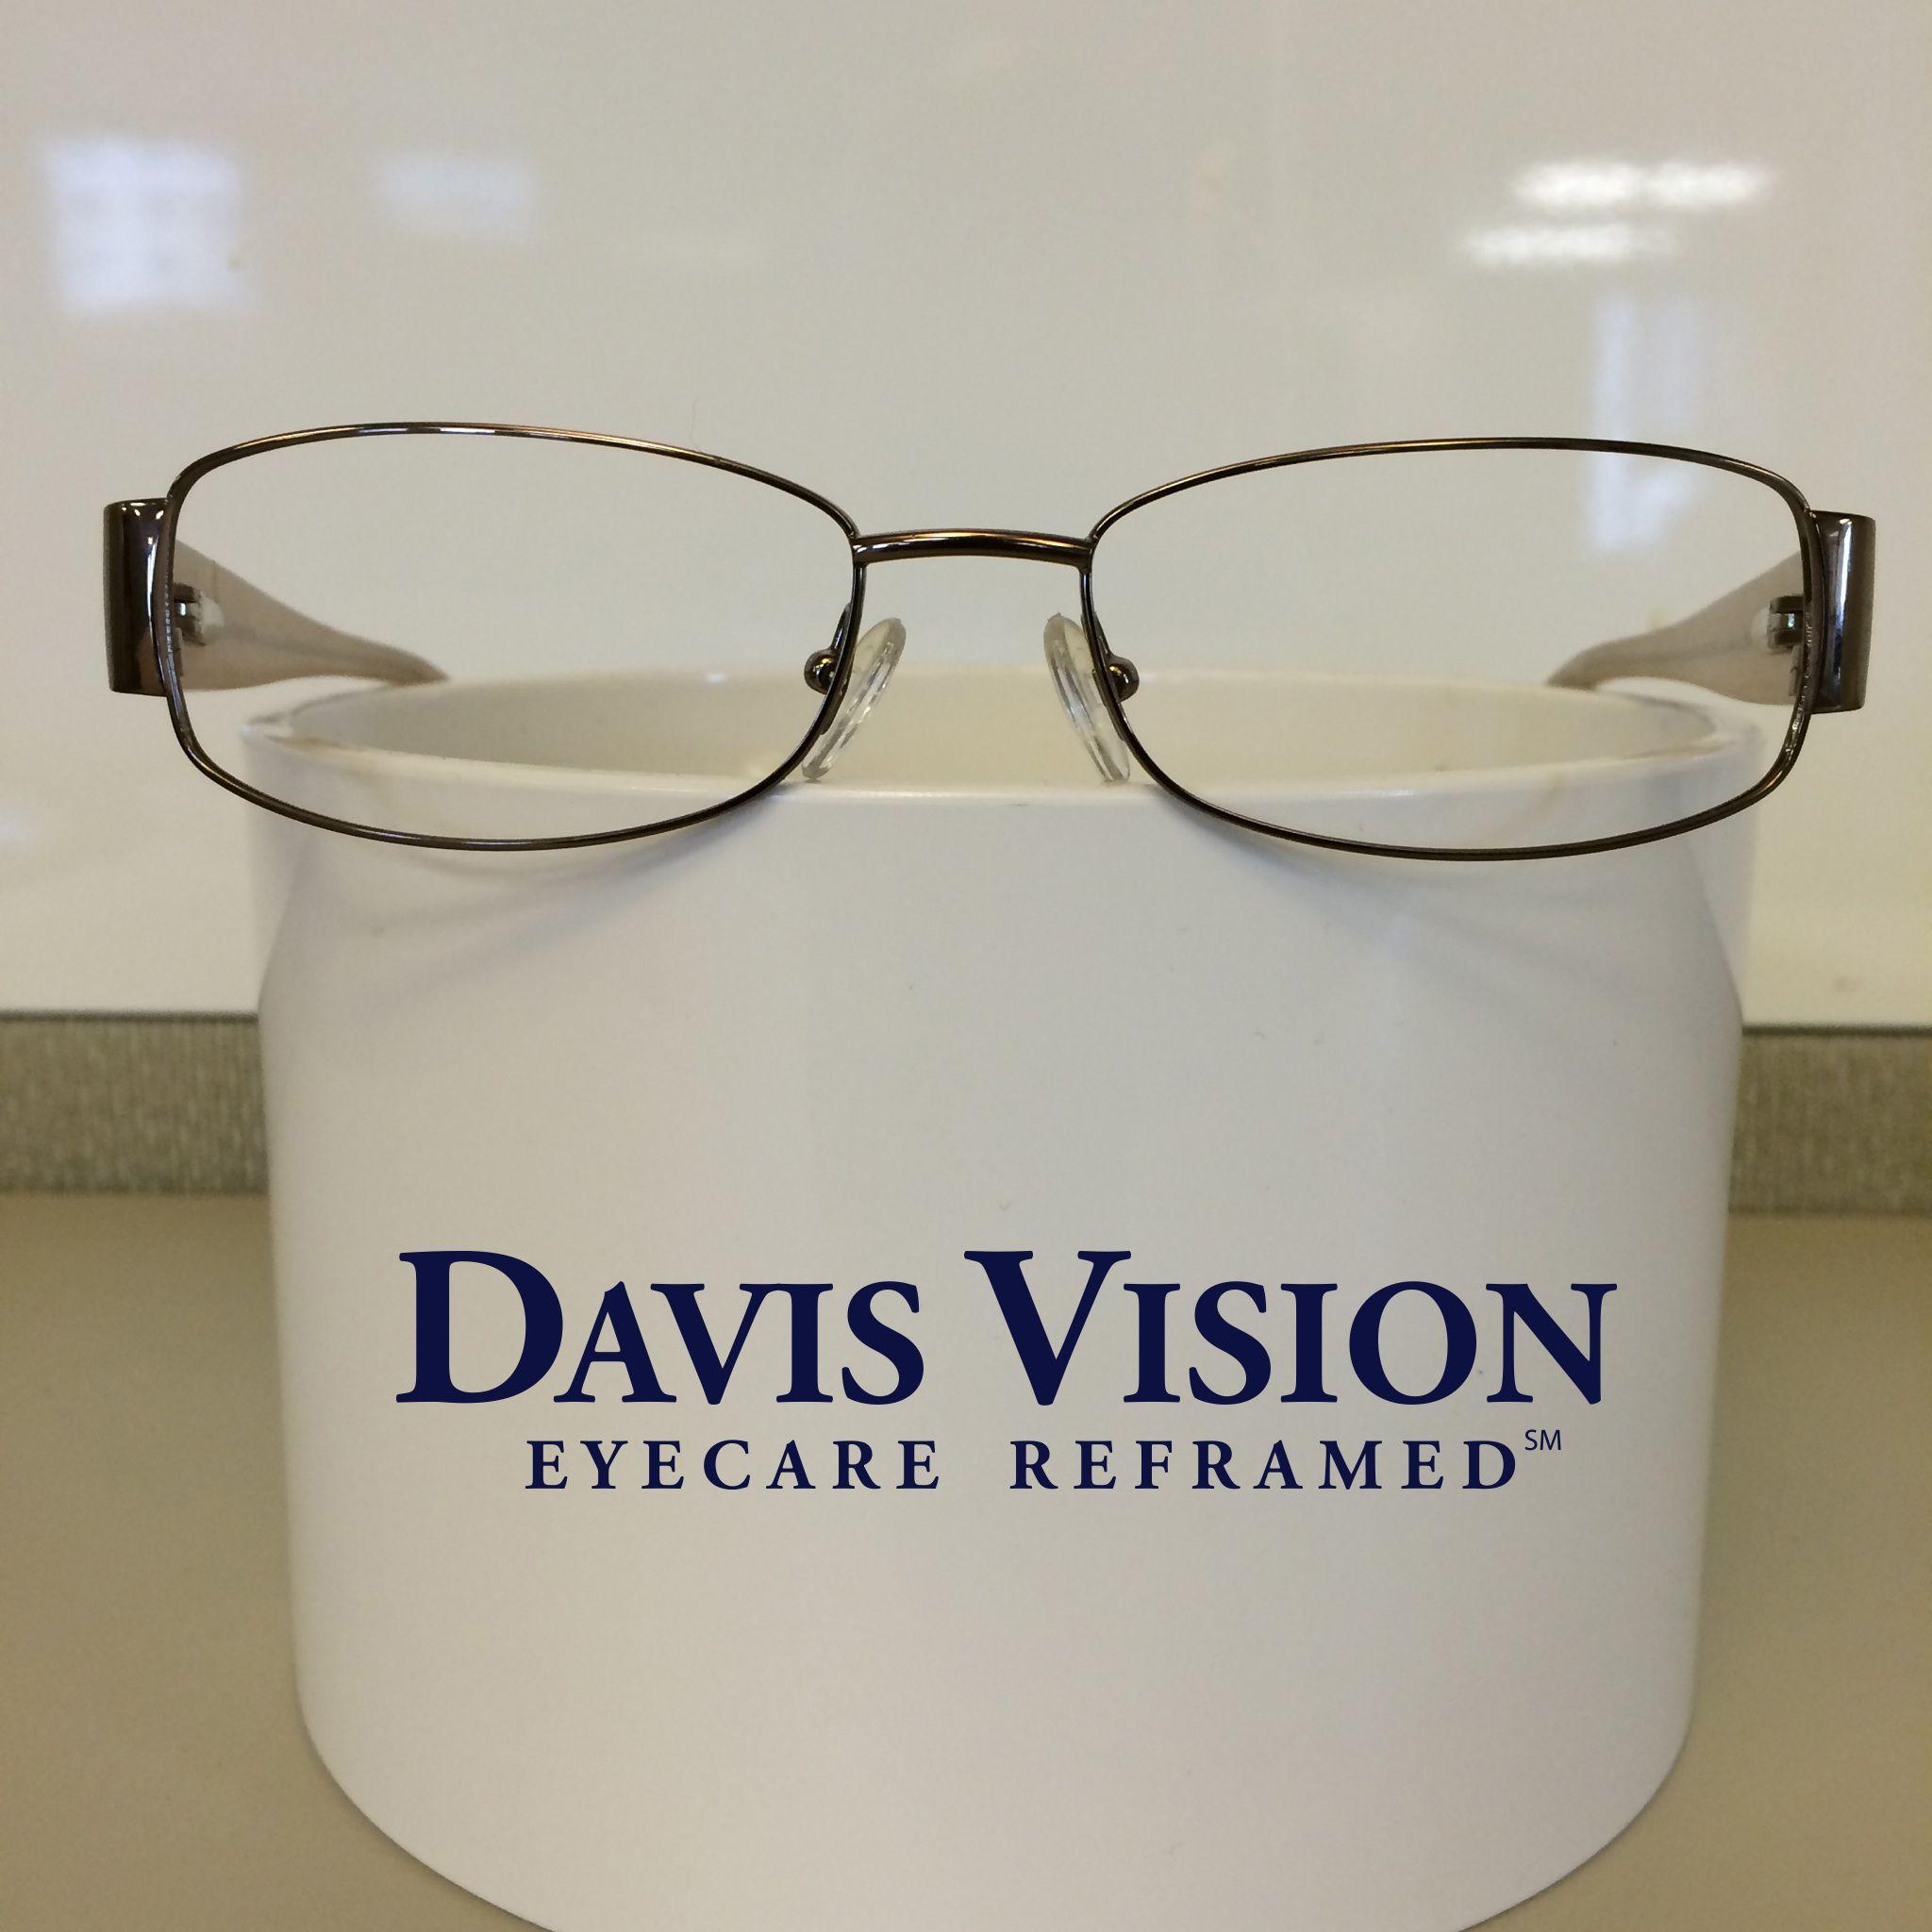 Davis vision frames emphasized fun fashion trends